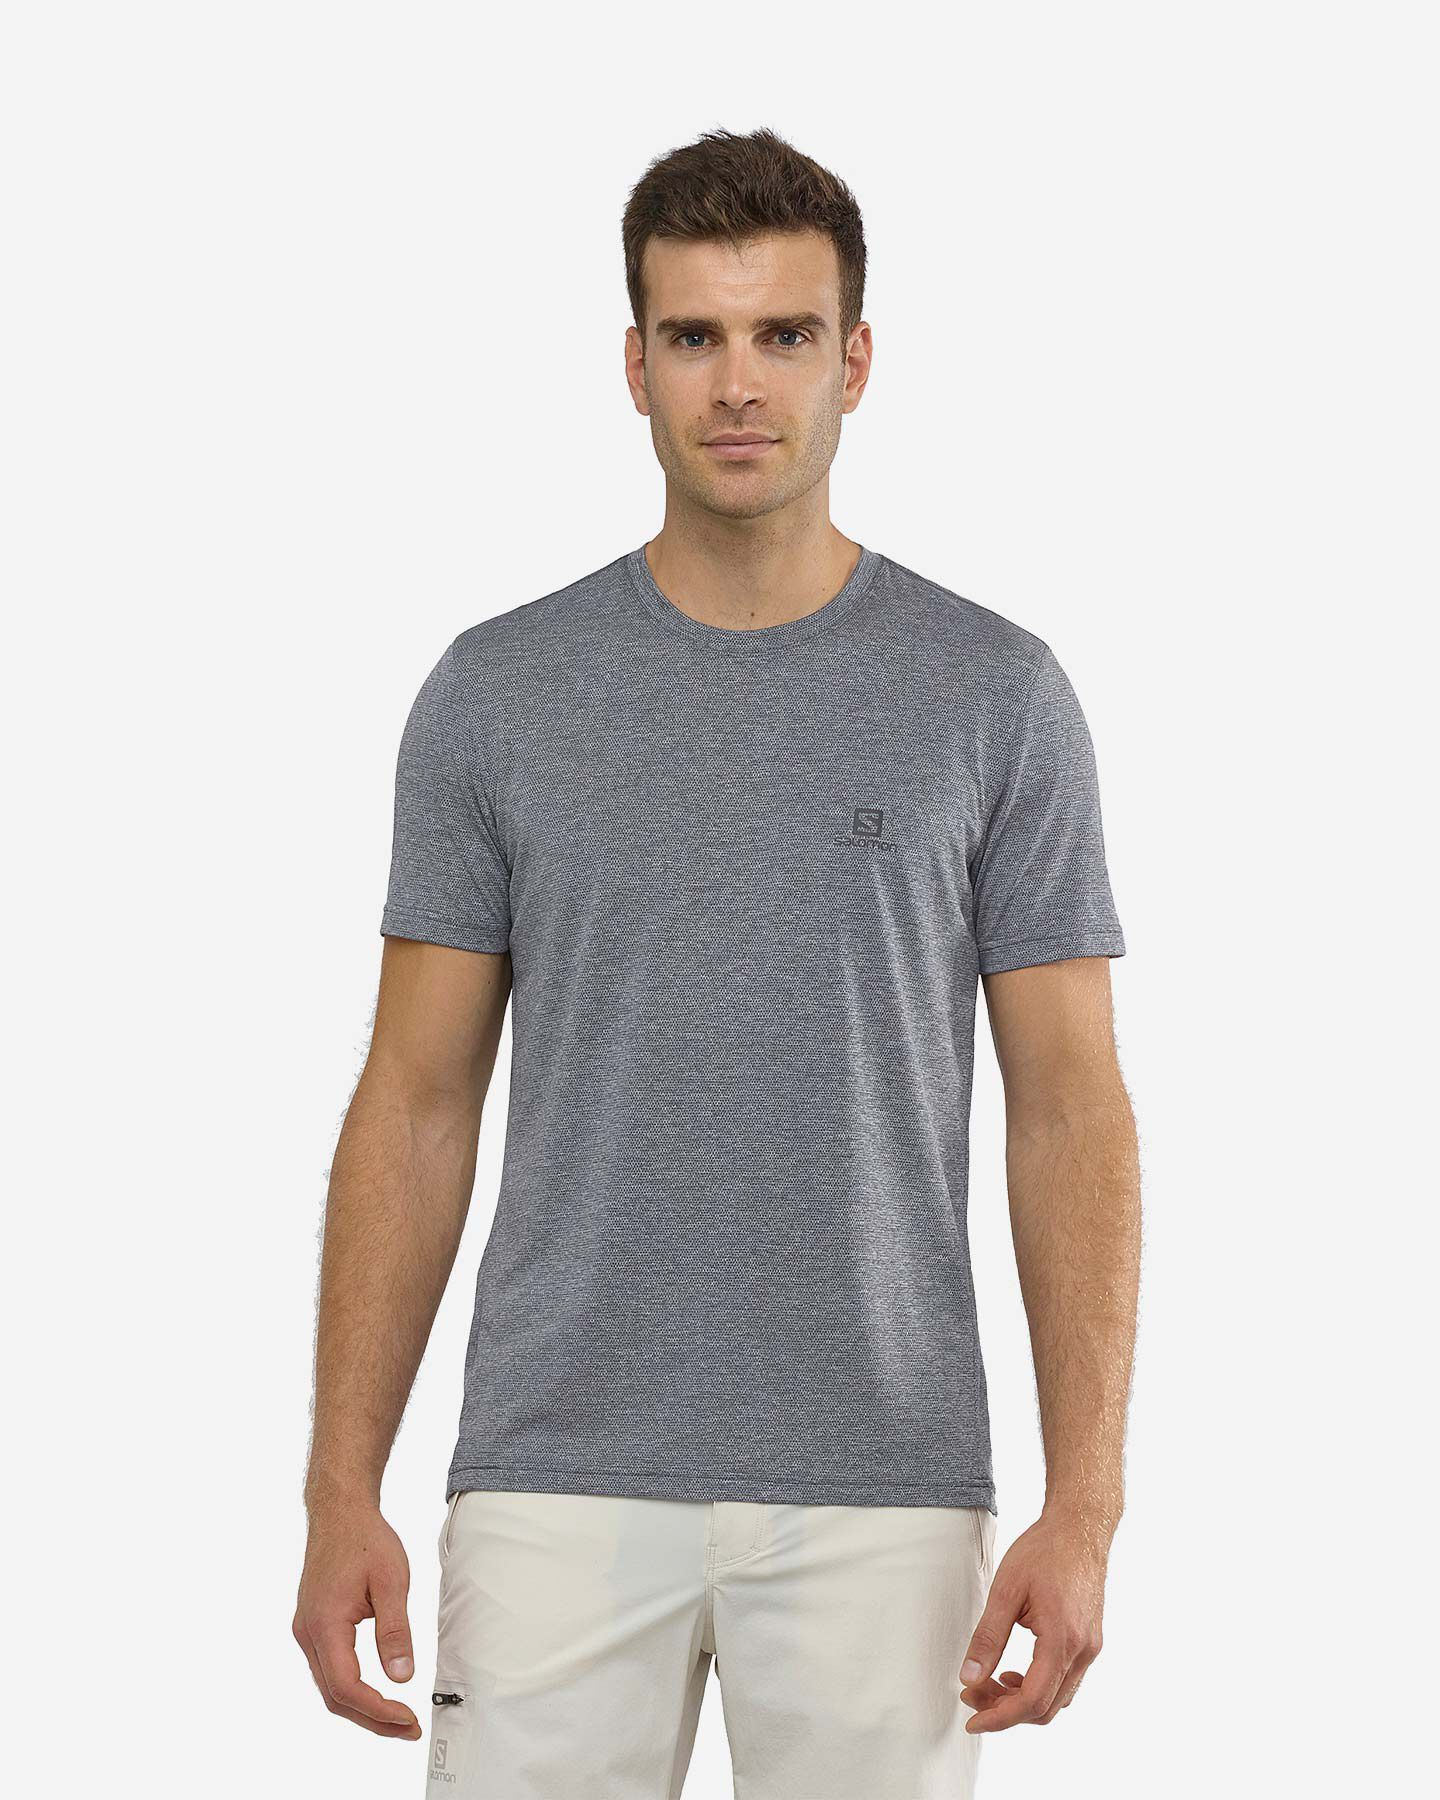 T-Shirt SALOMON EXPLORE PIQUE M S5173794 scatto 2